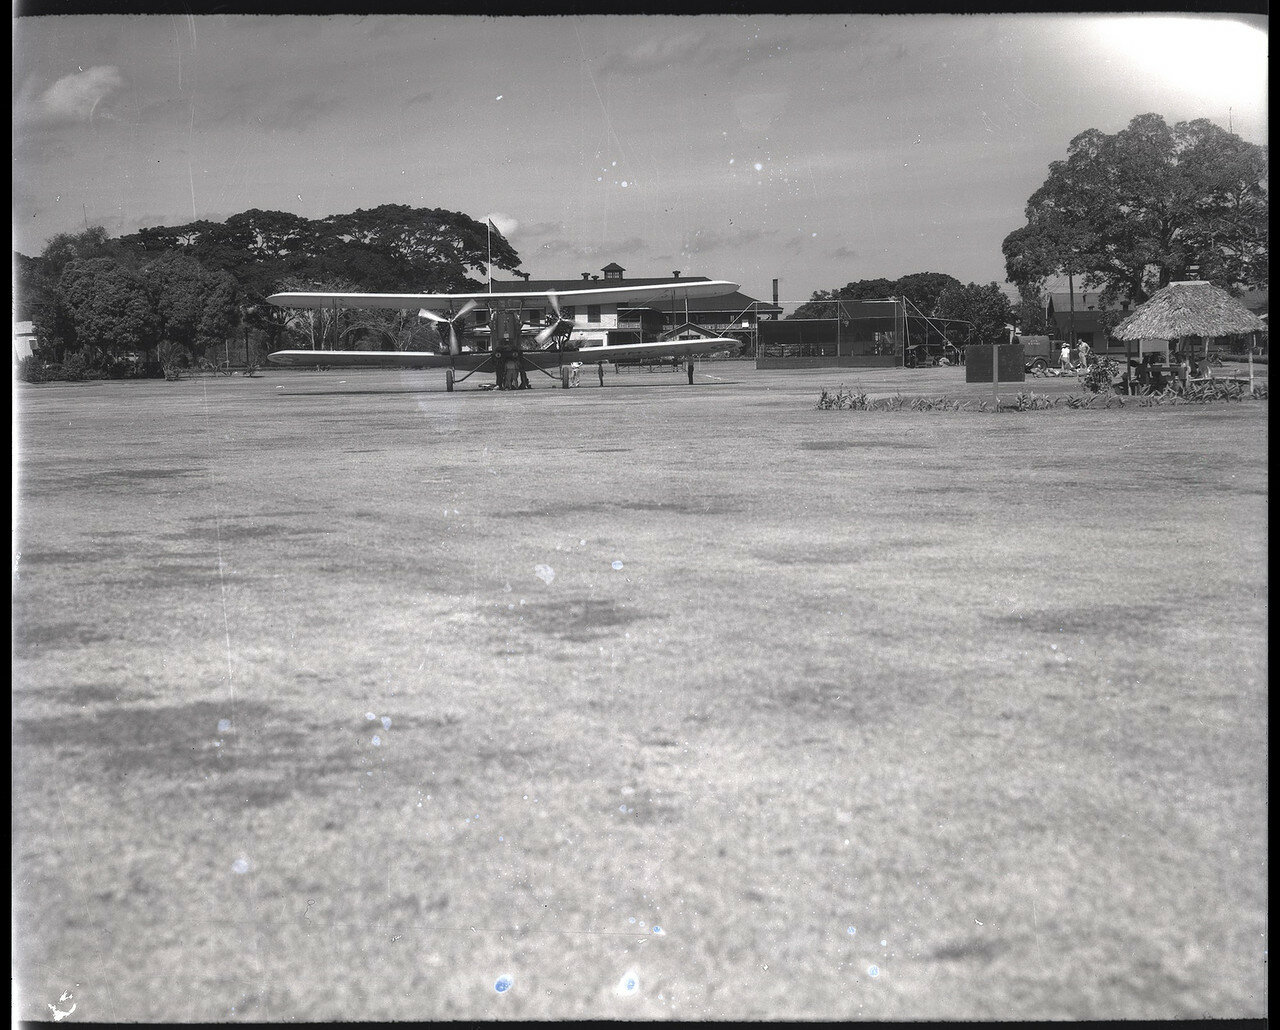 05. Бомбардировщик B-3A на филиппинском аэродроме Николс Филд